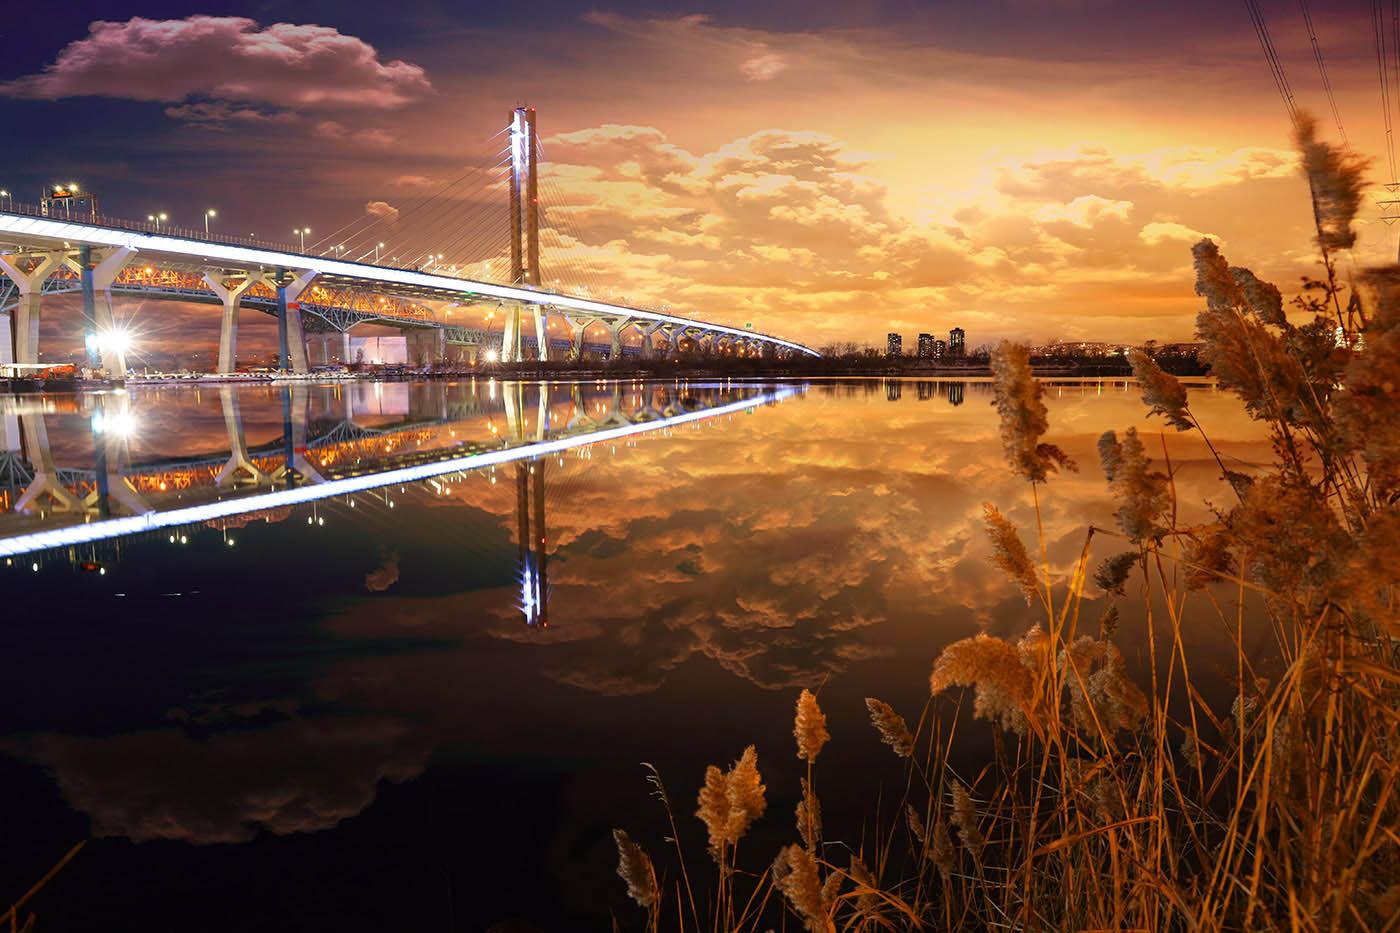 New Champlain Bridge in Montreal City - Colorful Stock Photos